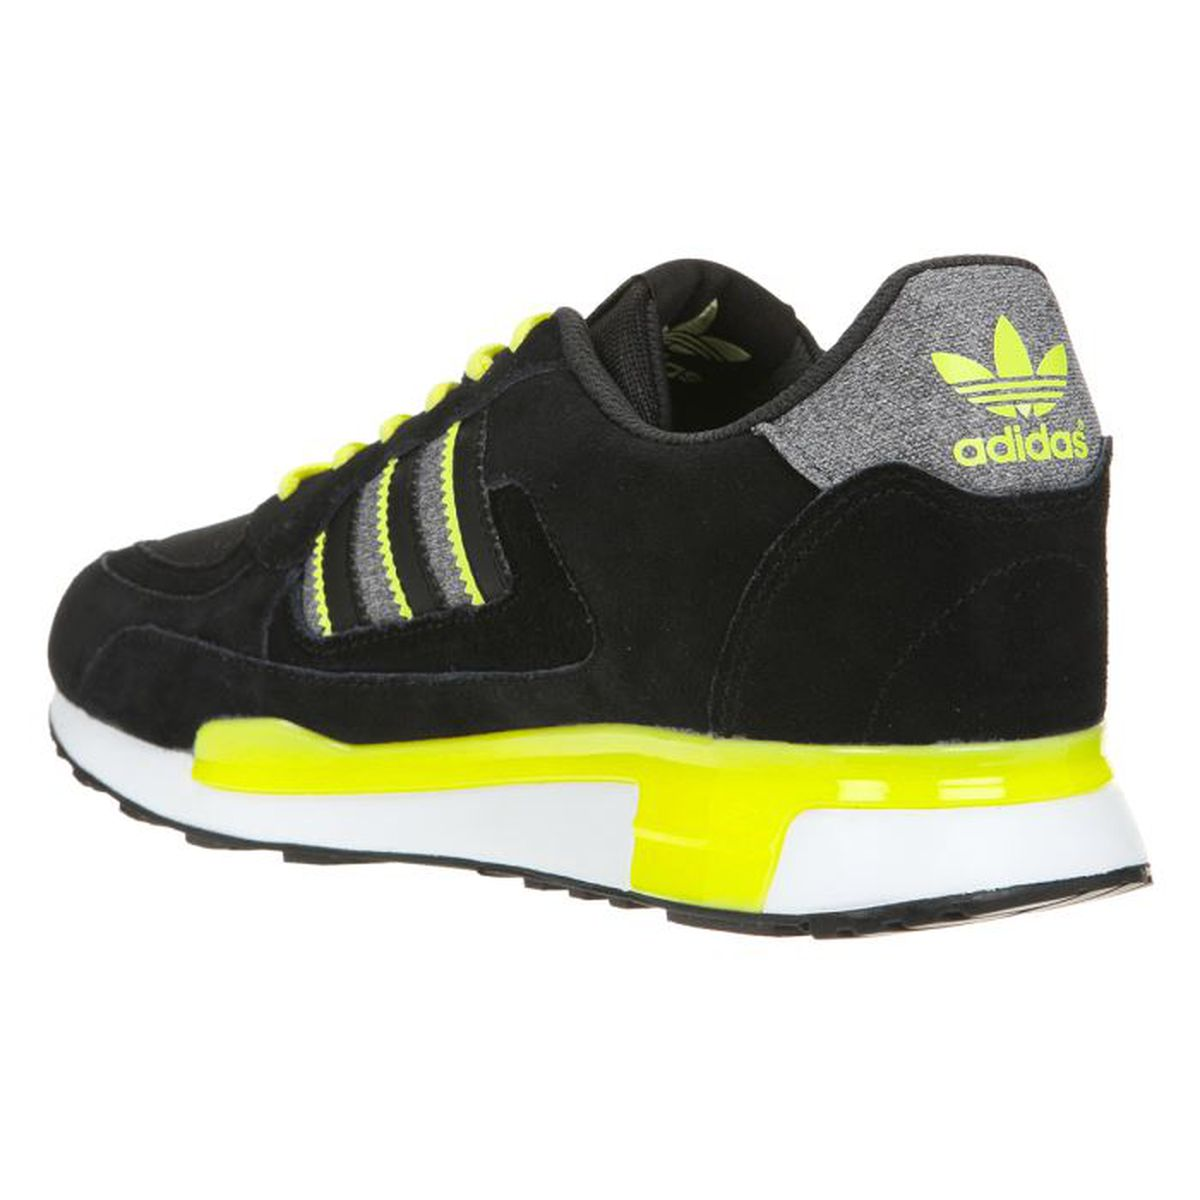 adidas zx 850 jaune